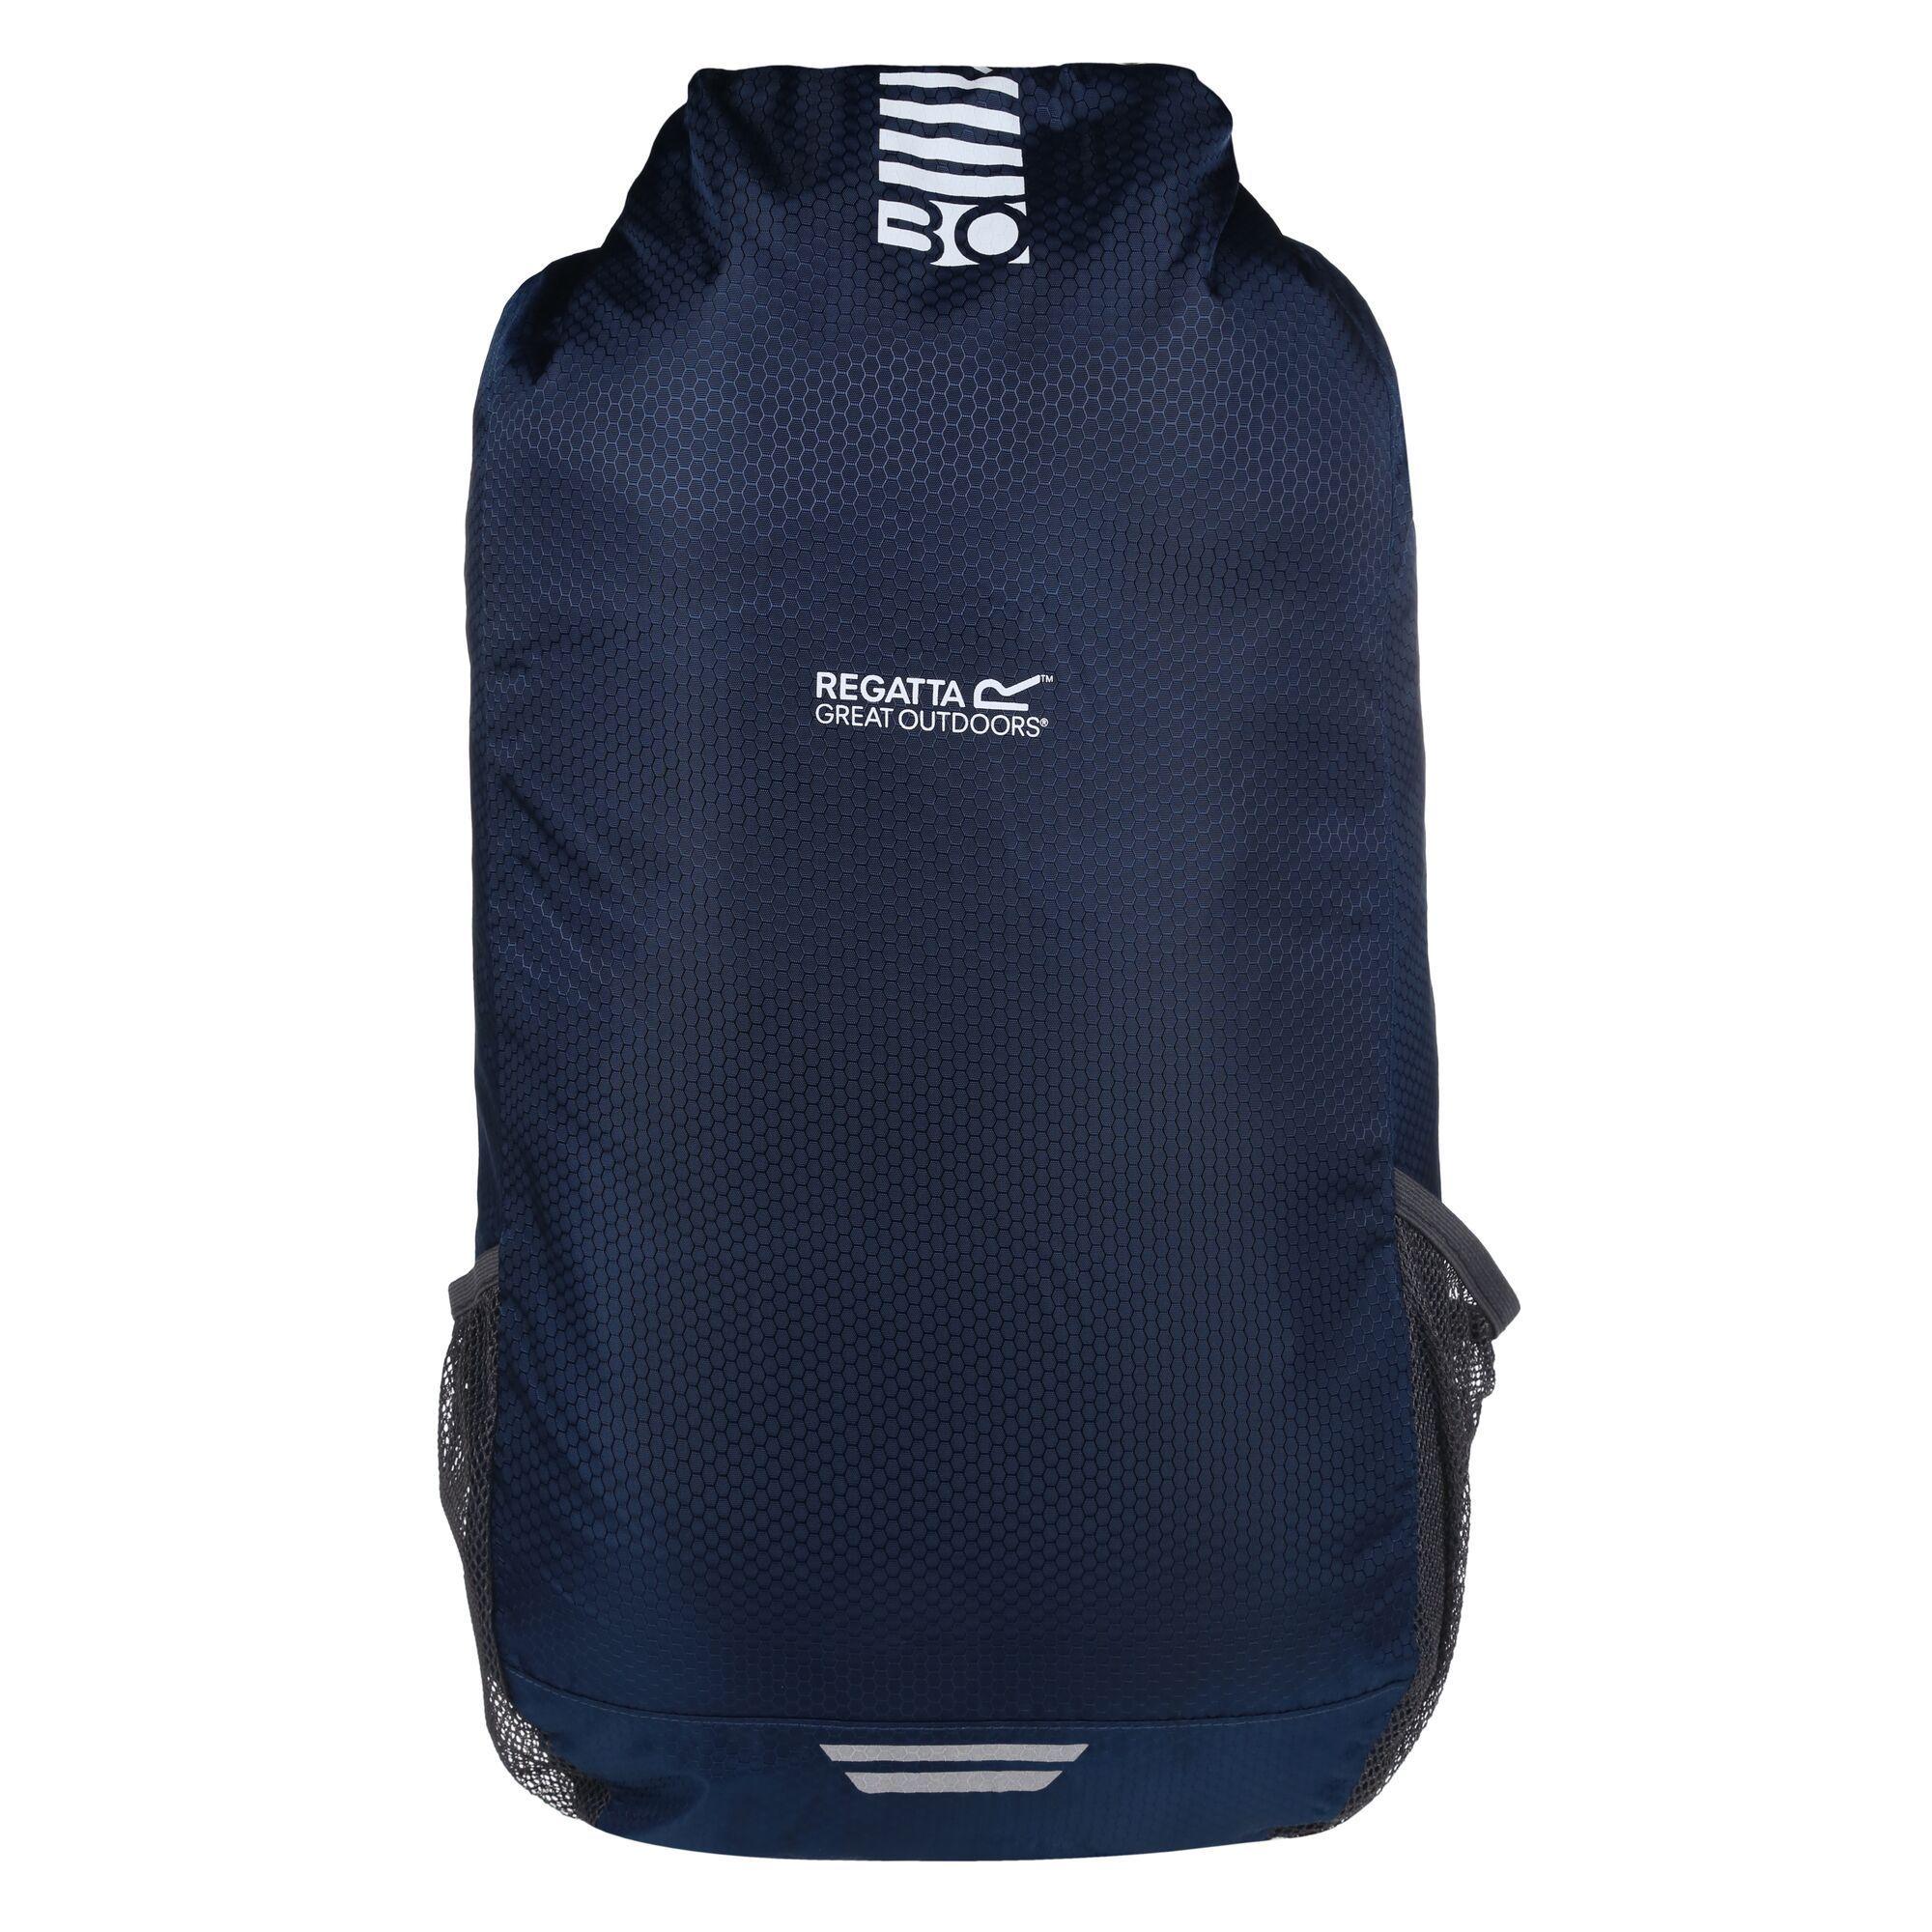 Regatta Easypack 30L Backpack (Dark Denim)